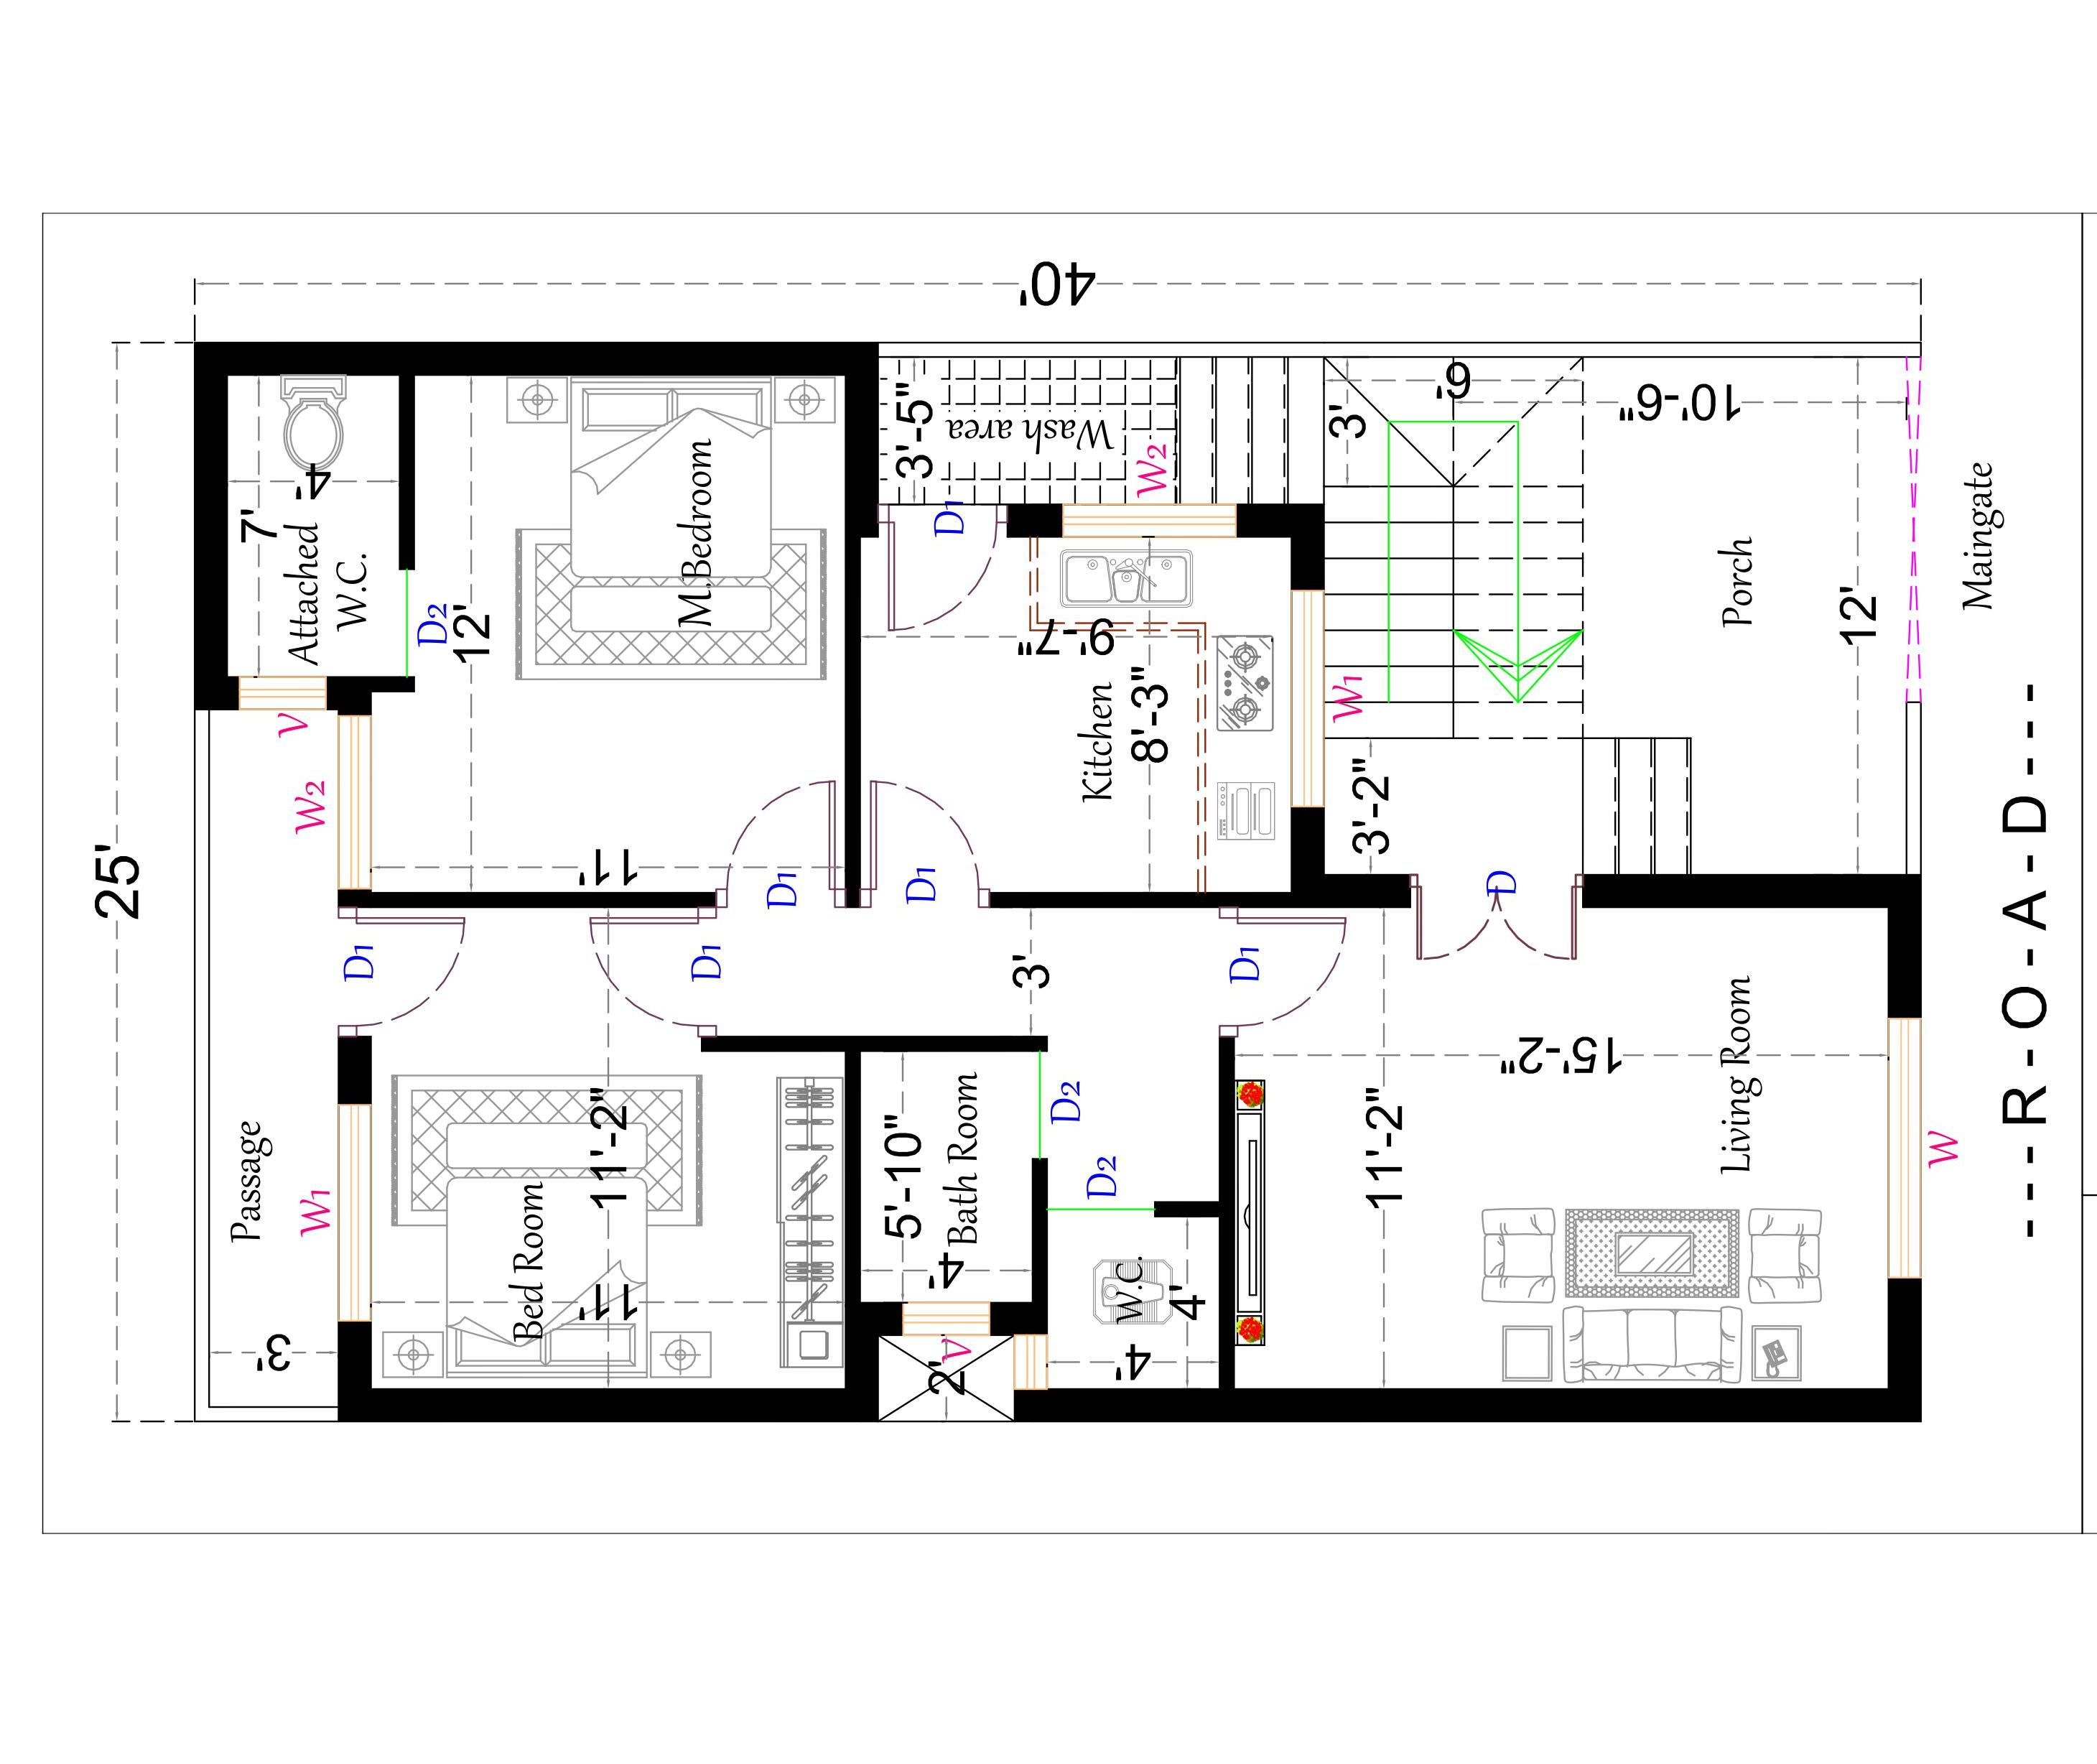 1000 sq. feet south facing house plan